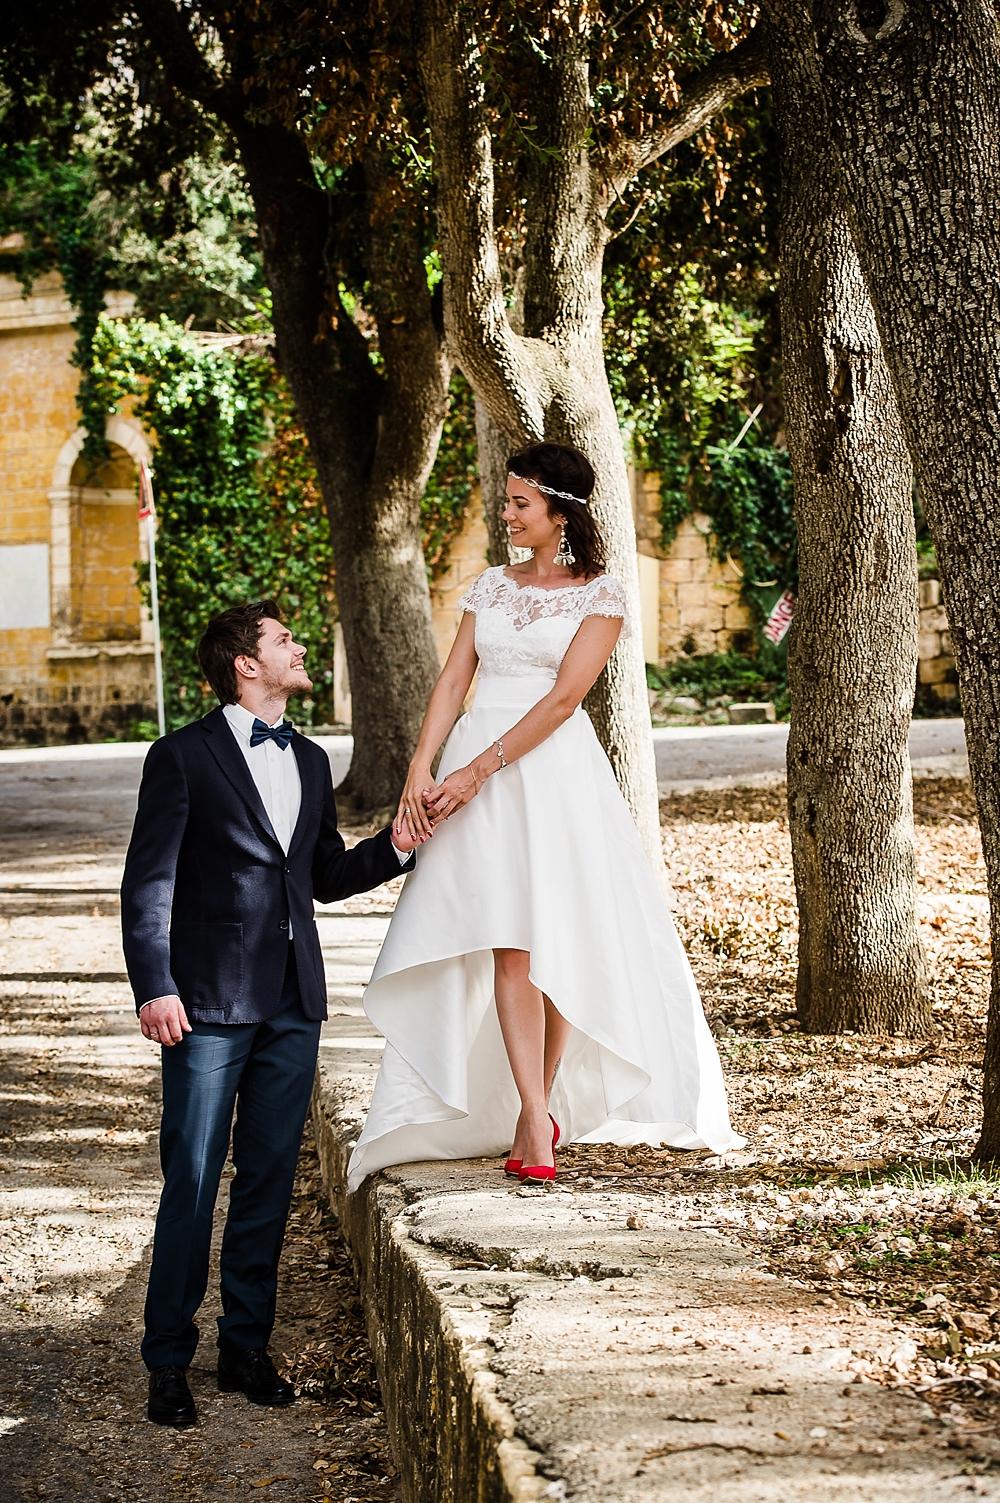 Honeymoon Photo Shoot Malta - Shane P. Watts Photography